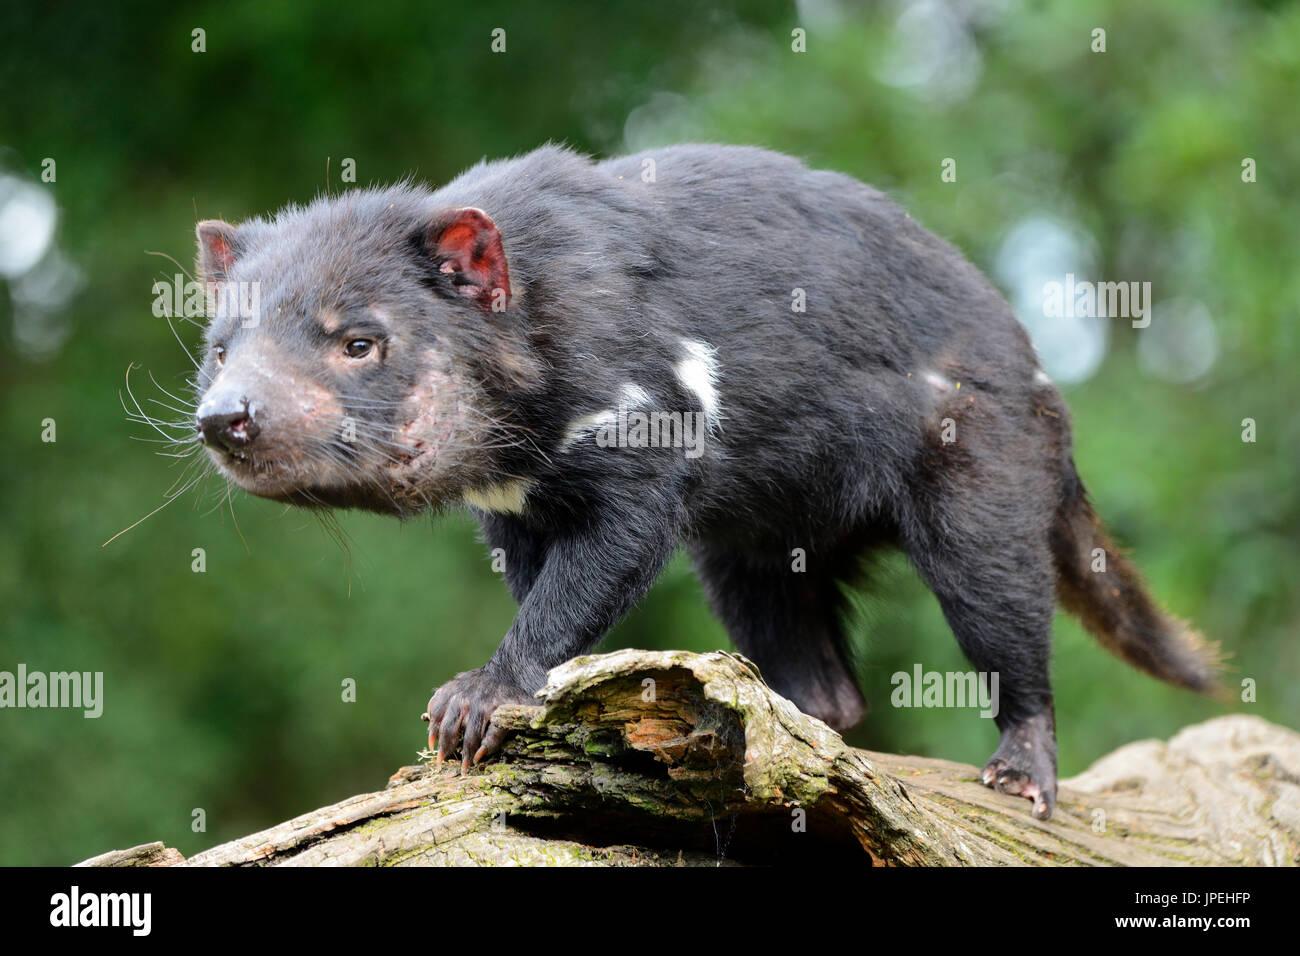 Tasmanian devil at the Tasmanian Devil Sanctuary at Cradle Mountain, Tasmania, Australia Stock Photo